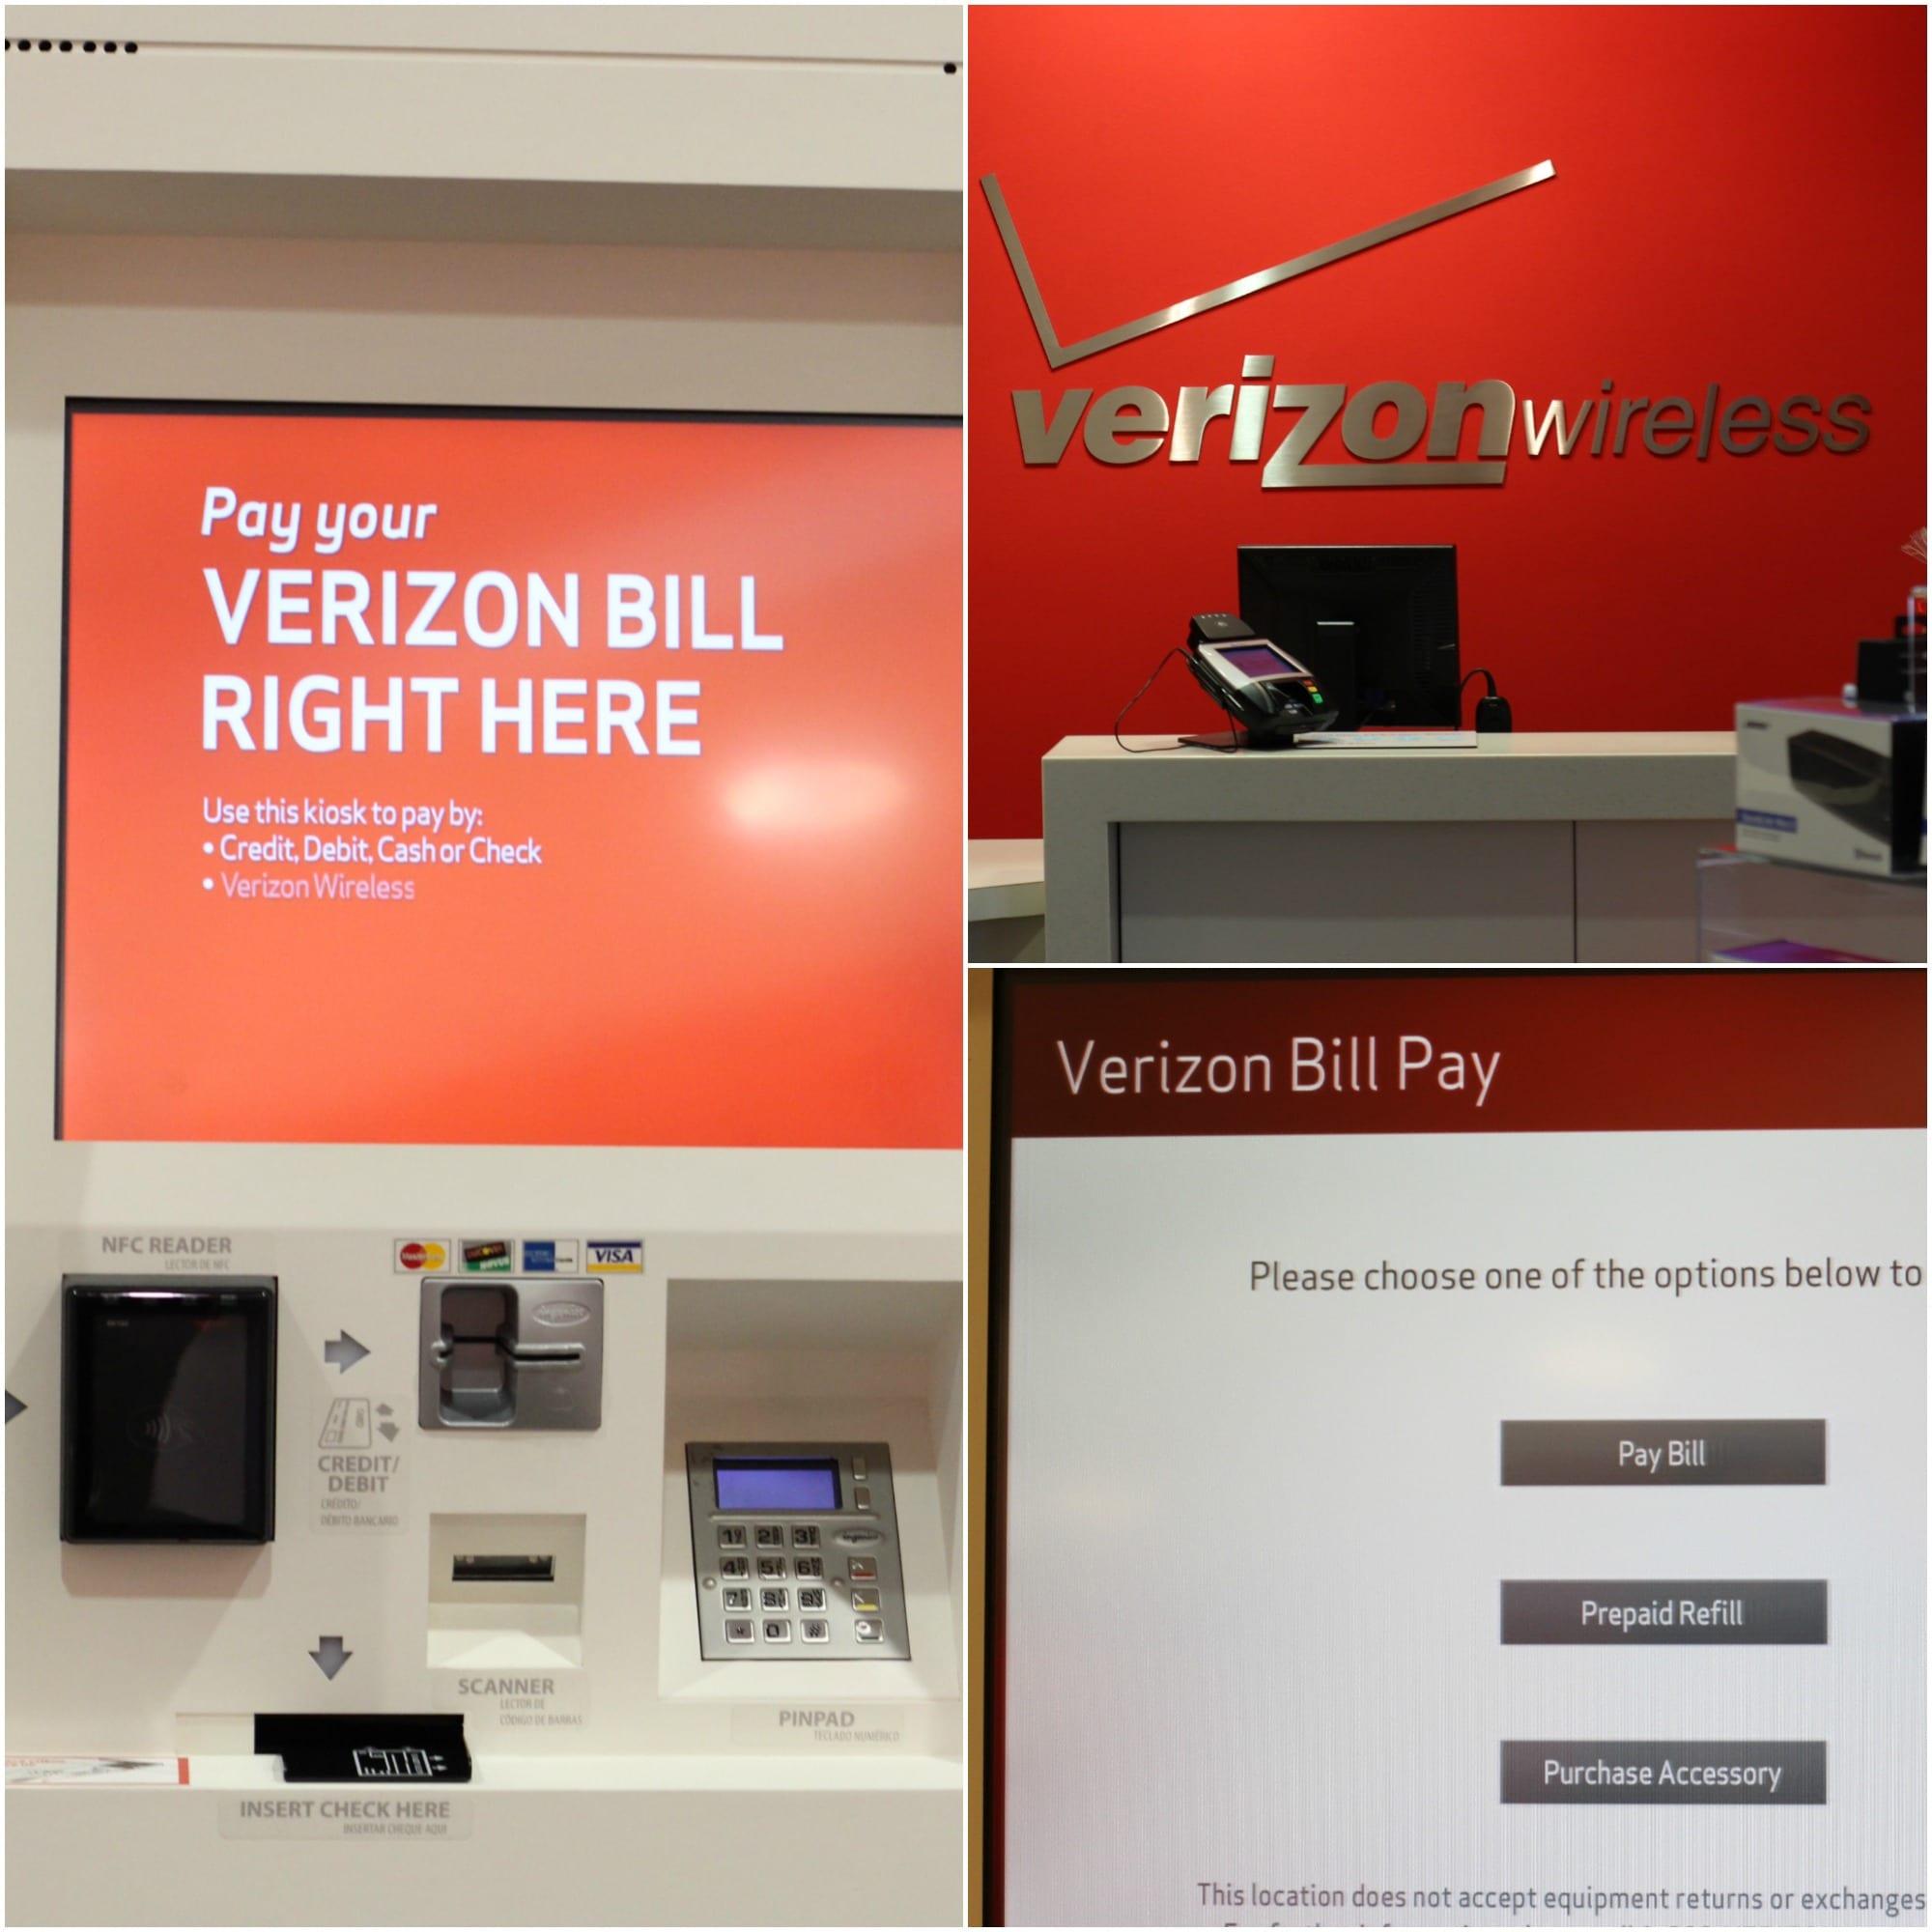 Verizon_Wireless_Pay_Bill